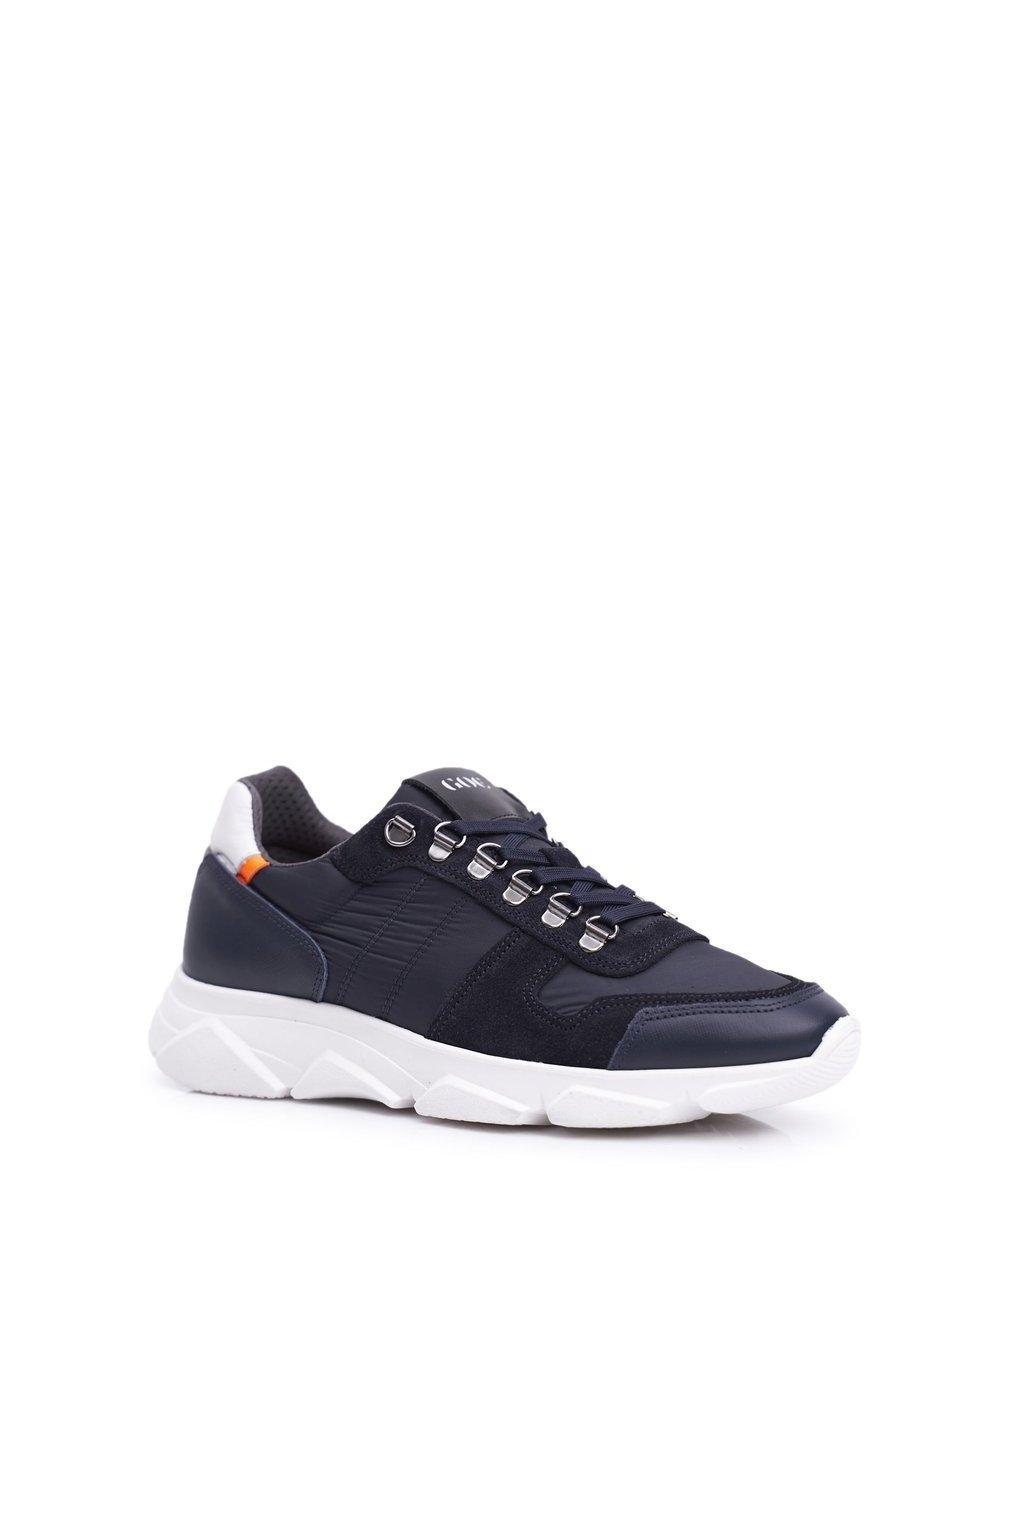 Modrá obuv kód topánok FF1N3020 NAVY